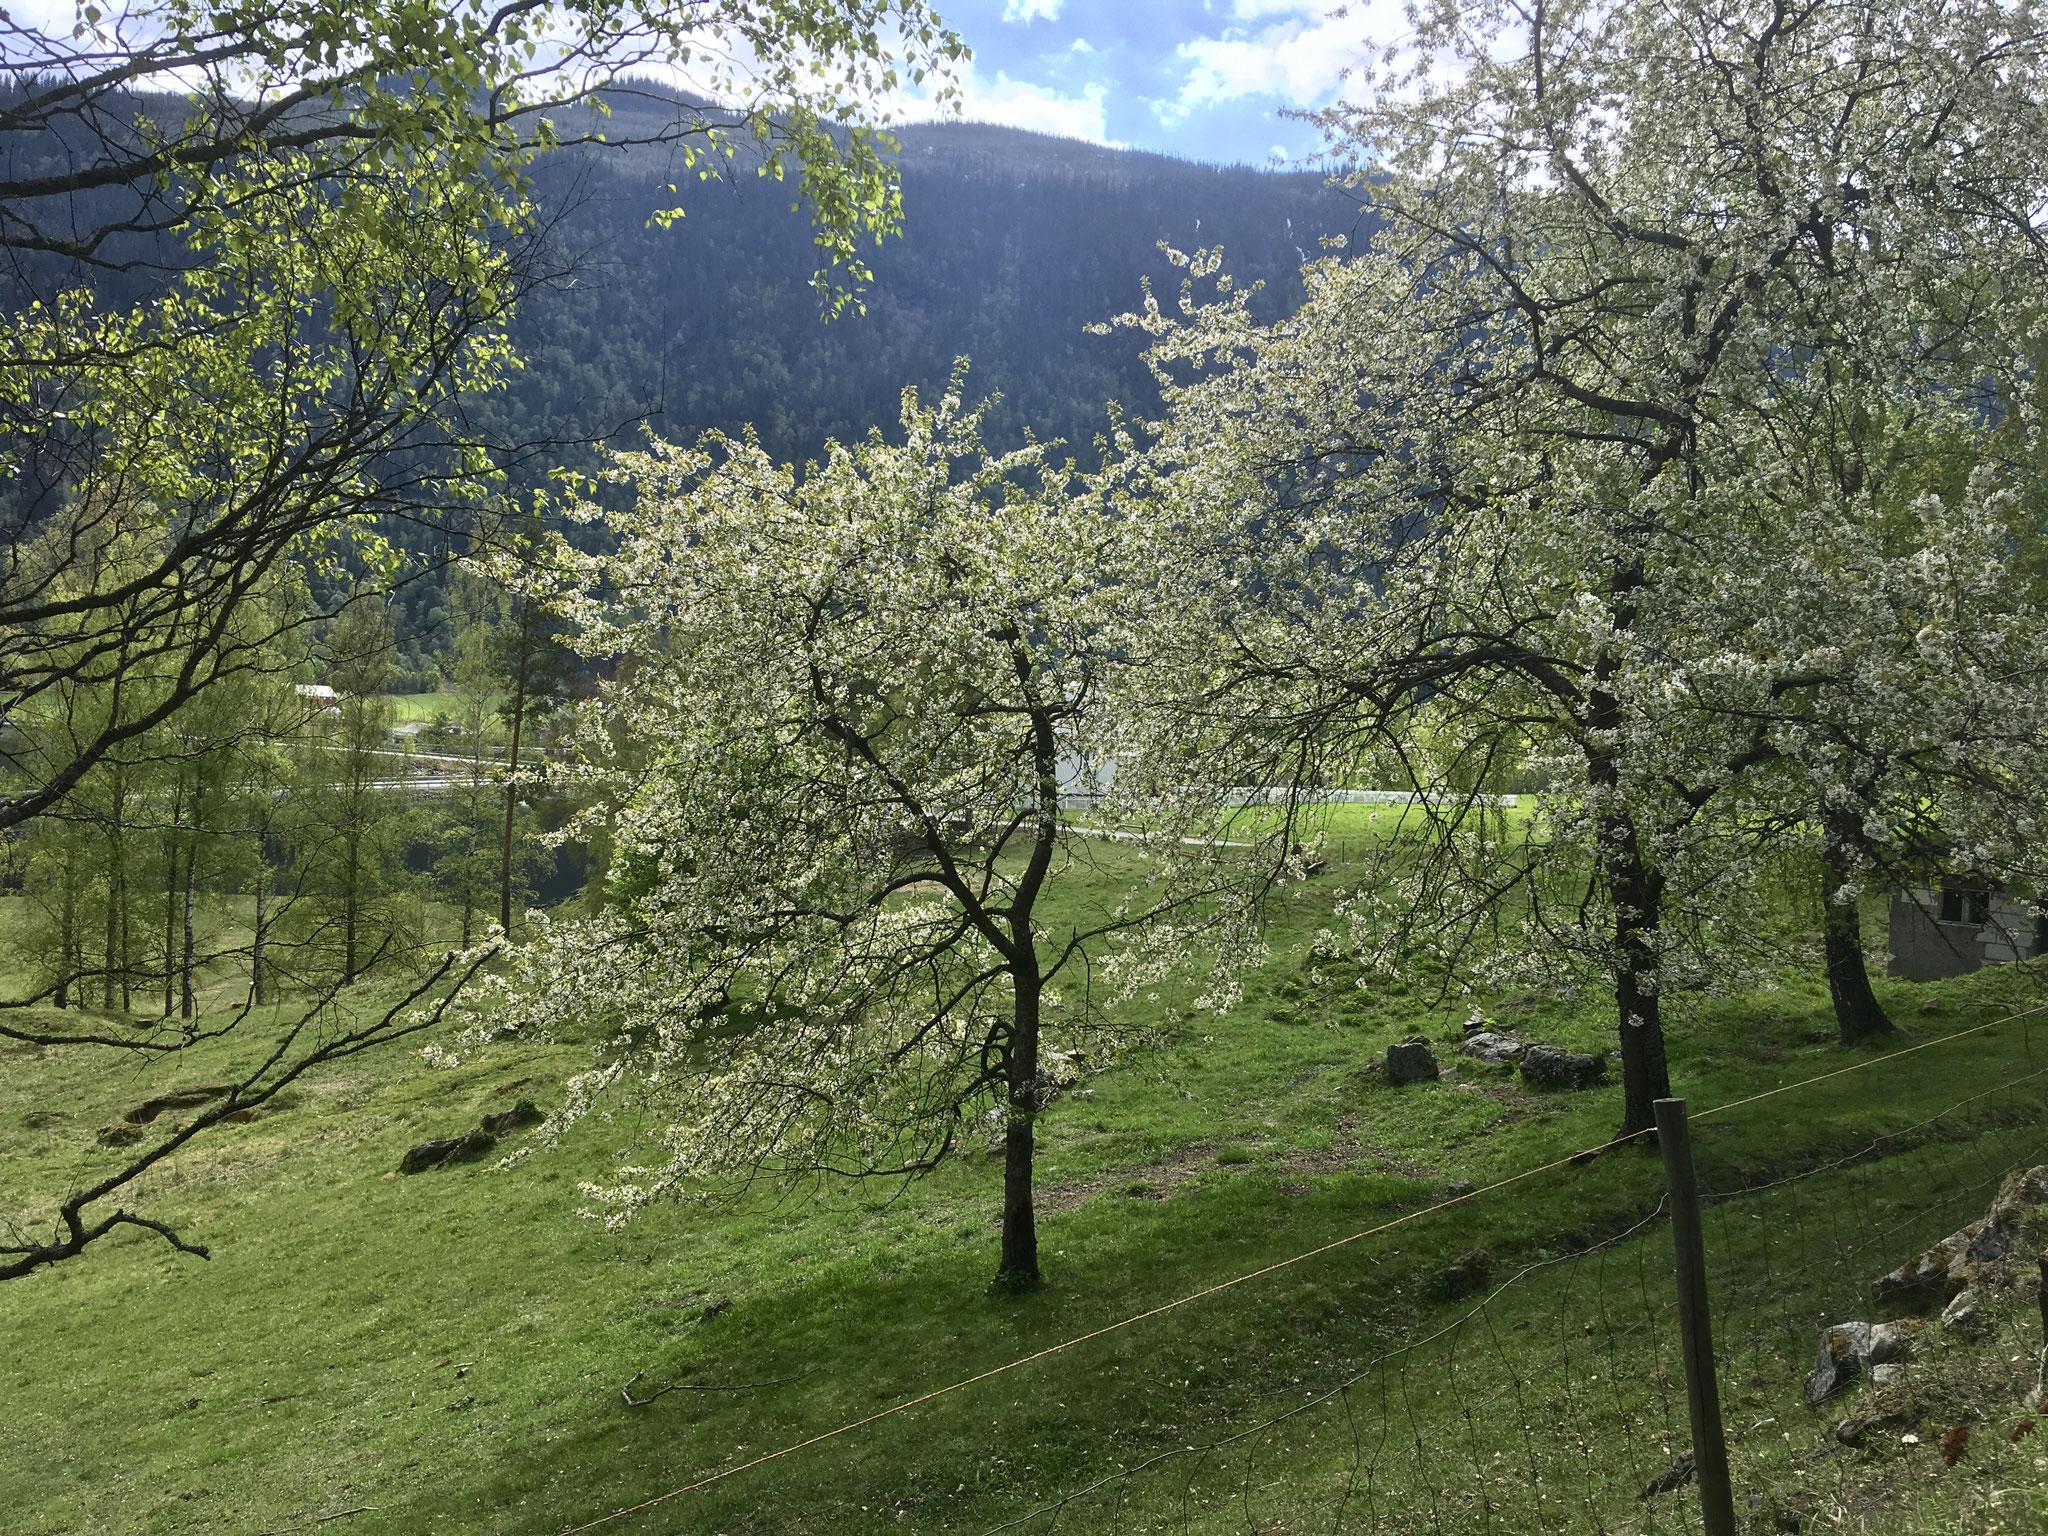 Mæl church in springtime